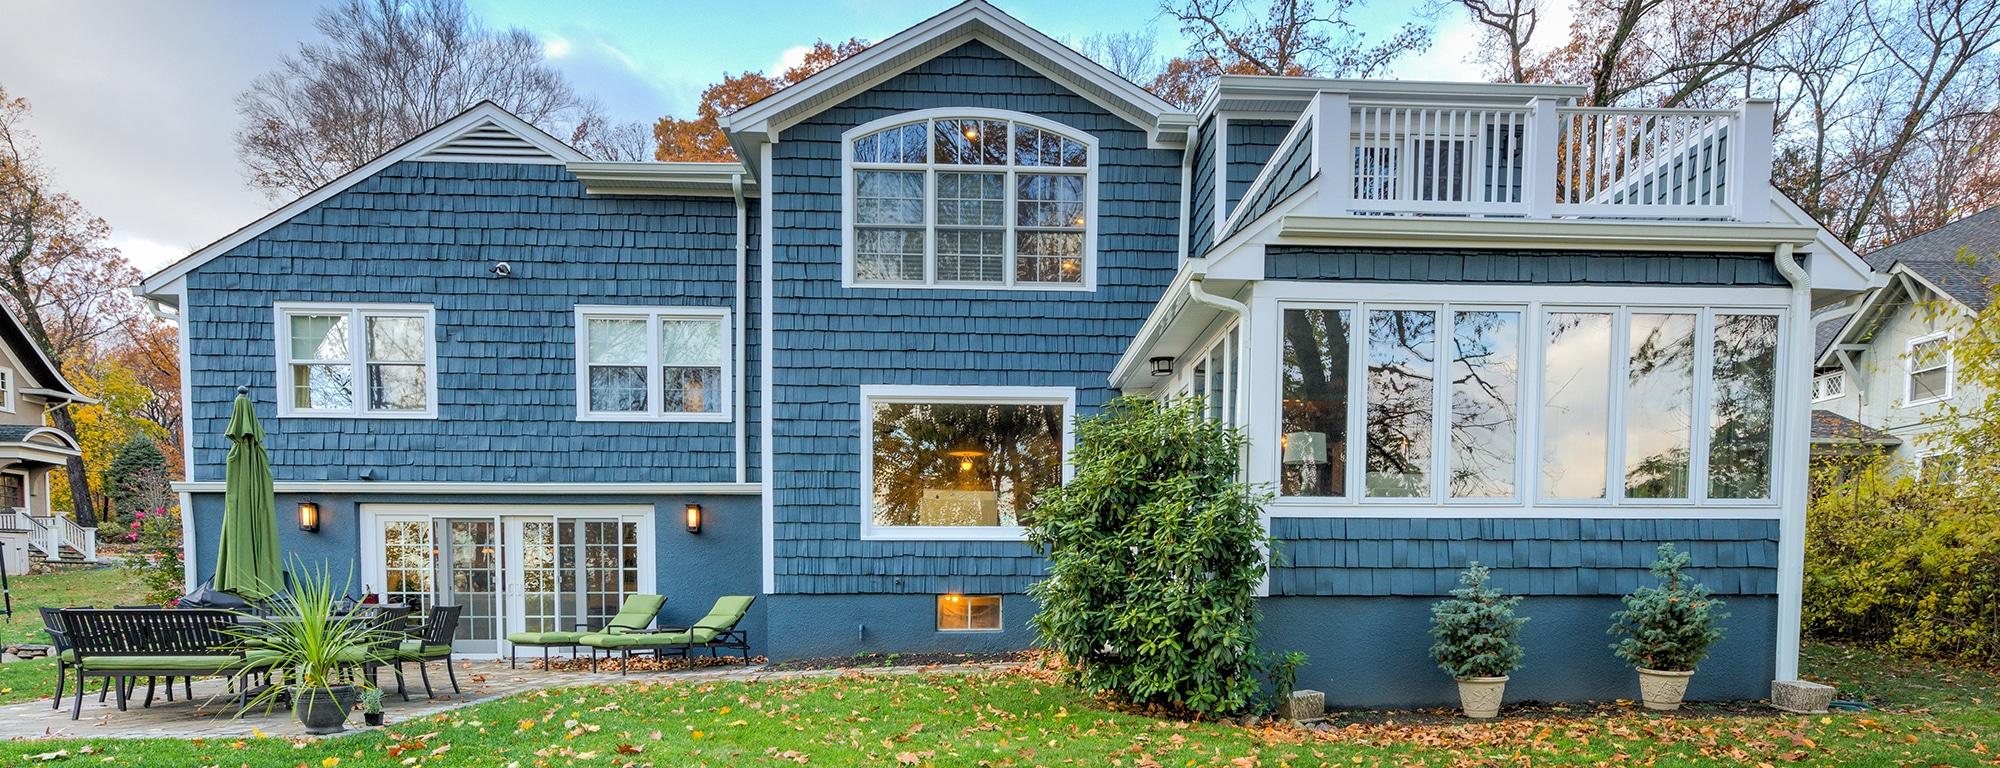 Home Renovation Architect NJ